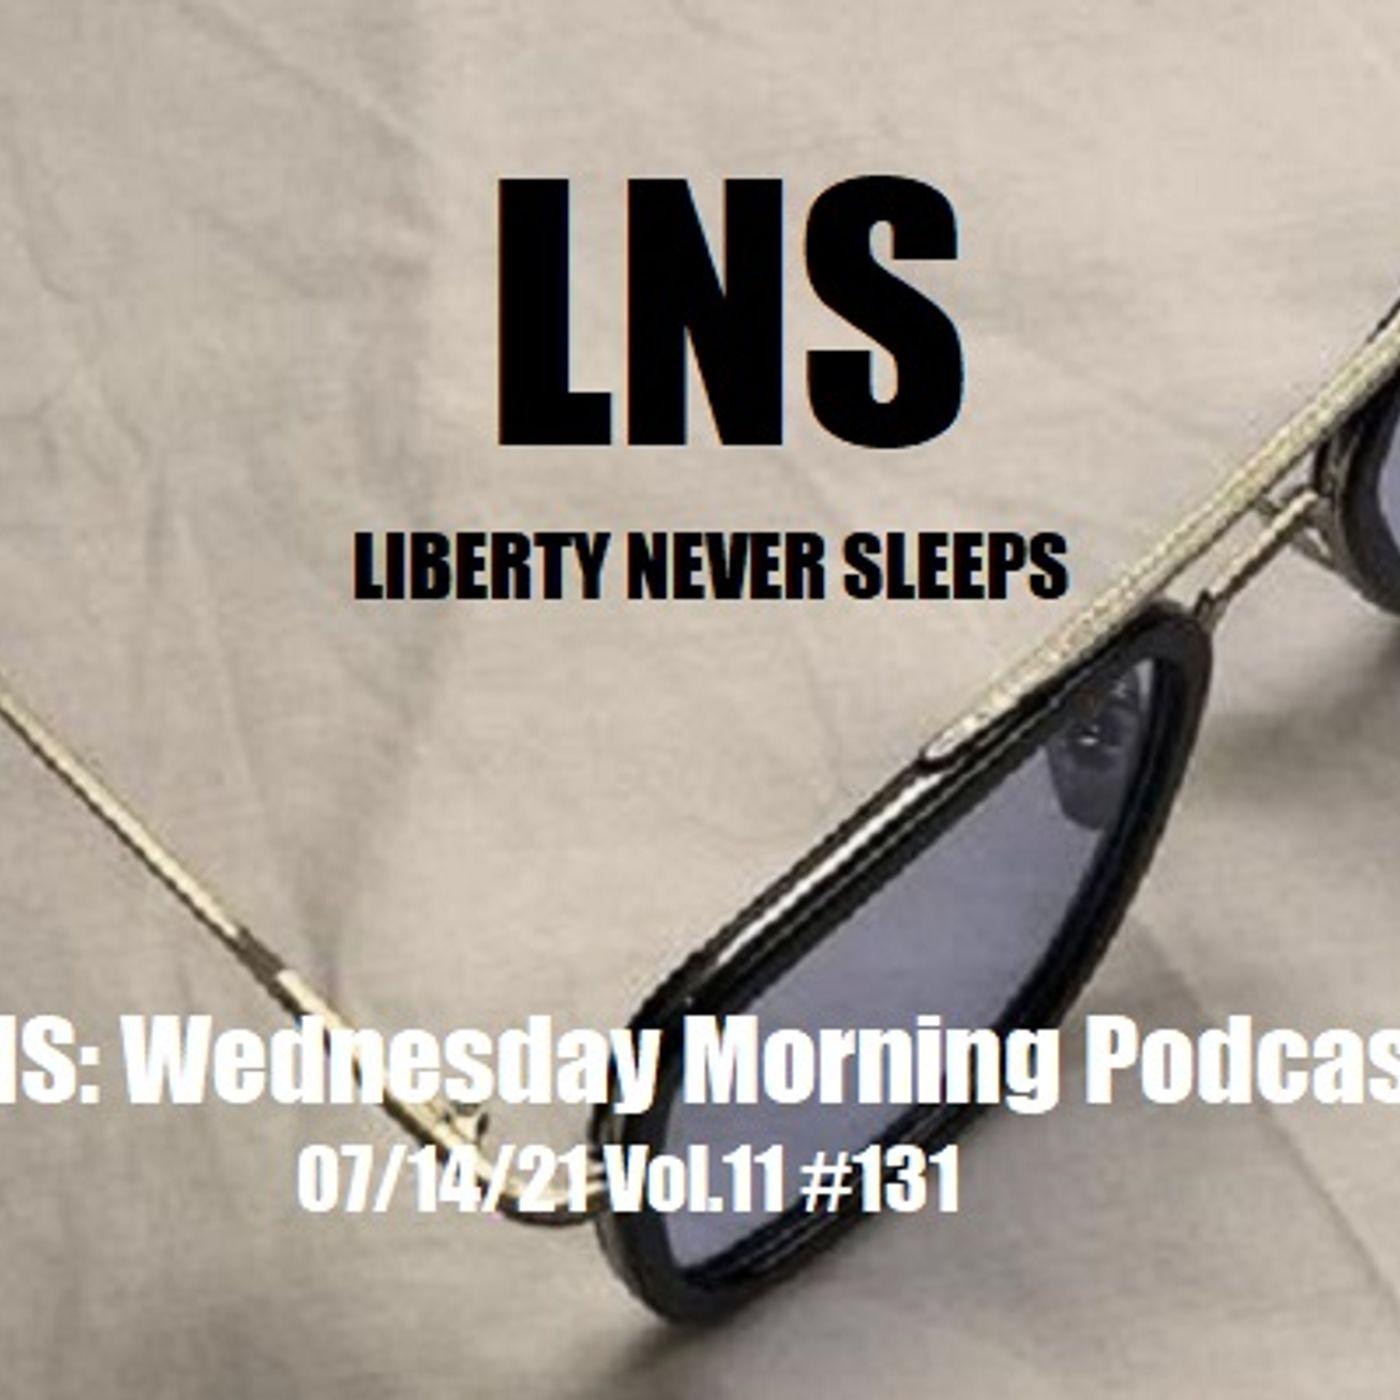 LNS: Wednesday Morning Podcast 07/14/21 Vol.11 #131